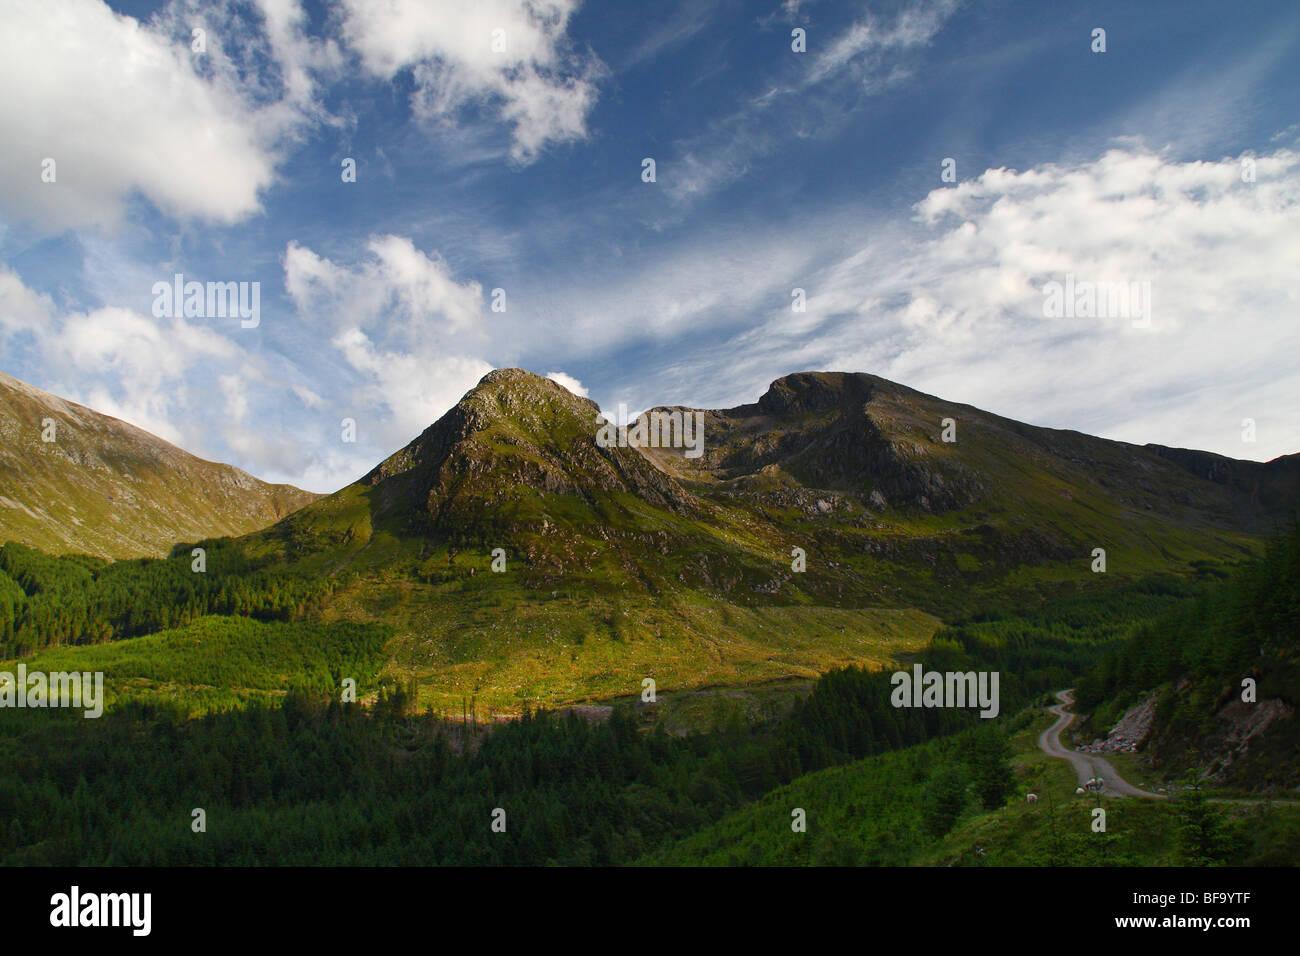 Sgorr Dhonuill summit, near Ballachulish, Highlands, Scotland, UK - Stock Image